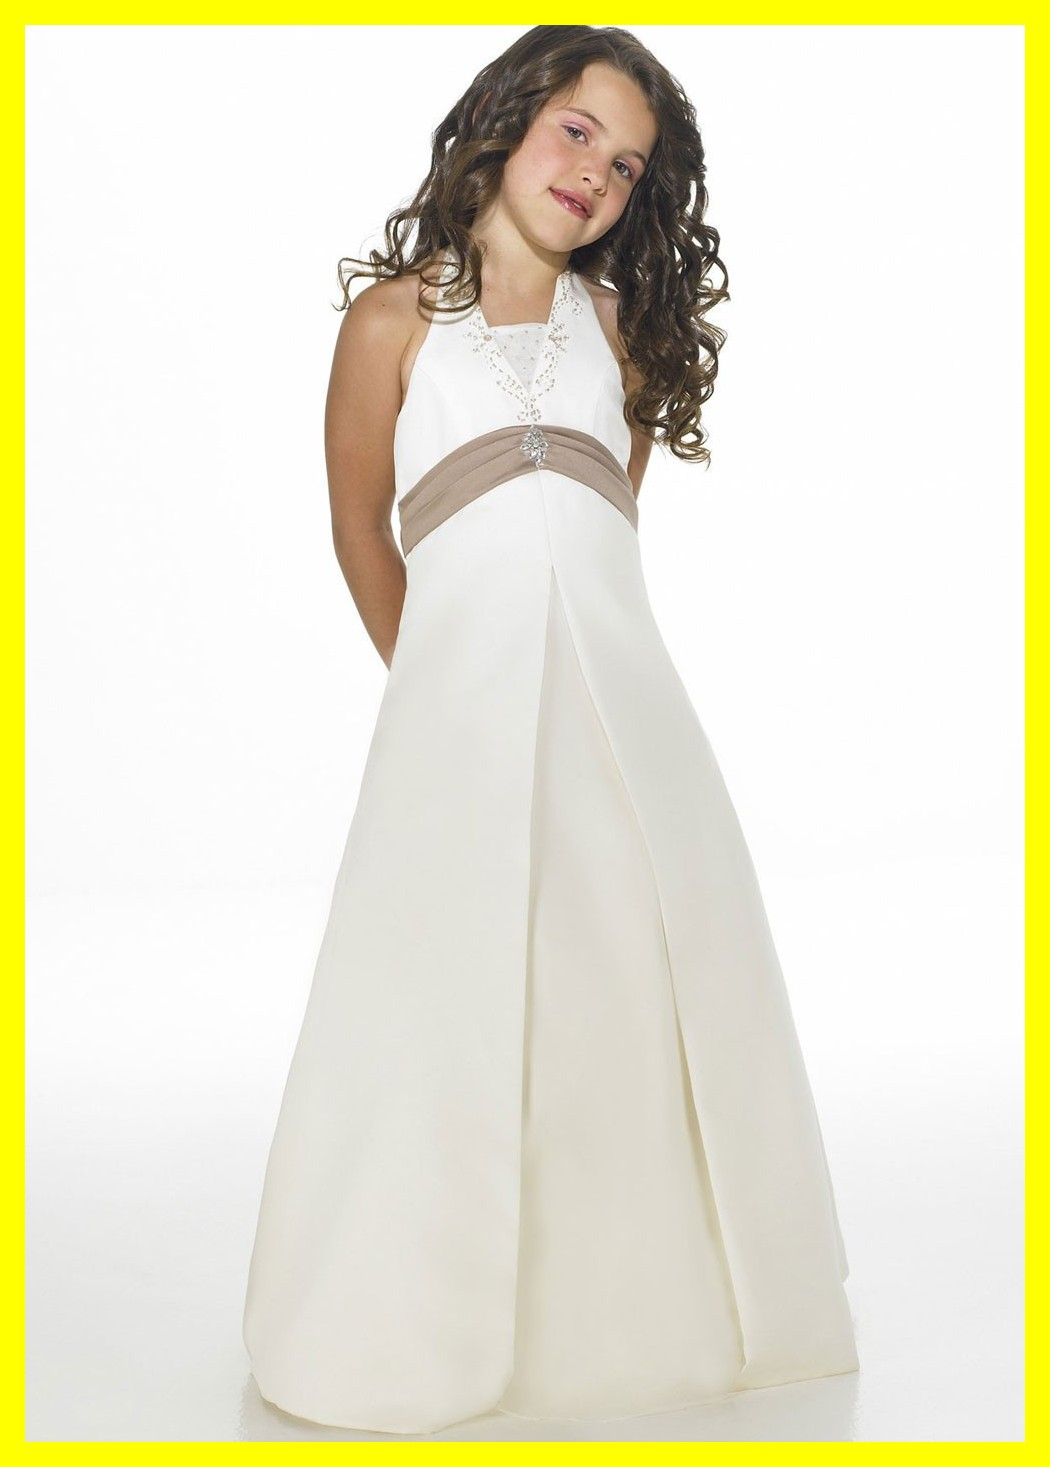 Confirmation dresses flower girl canada online gold girls for Dresses for girls for wedding